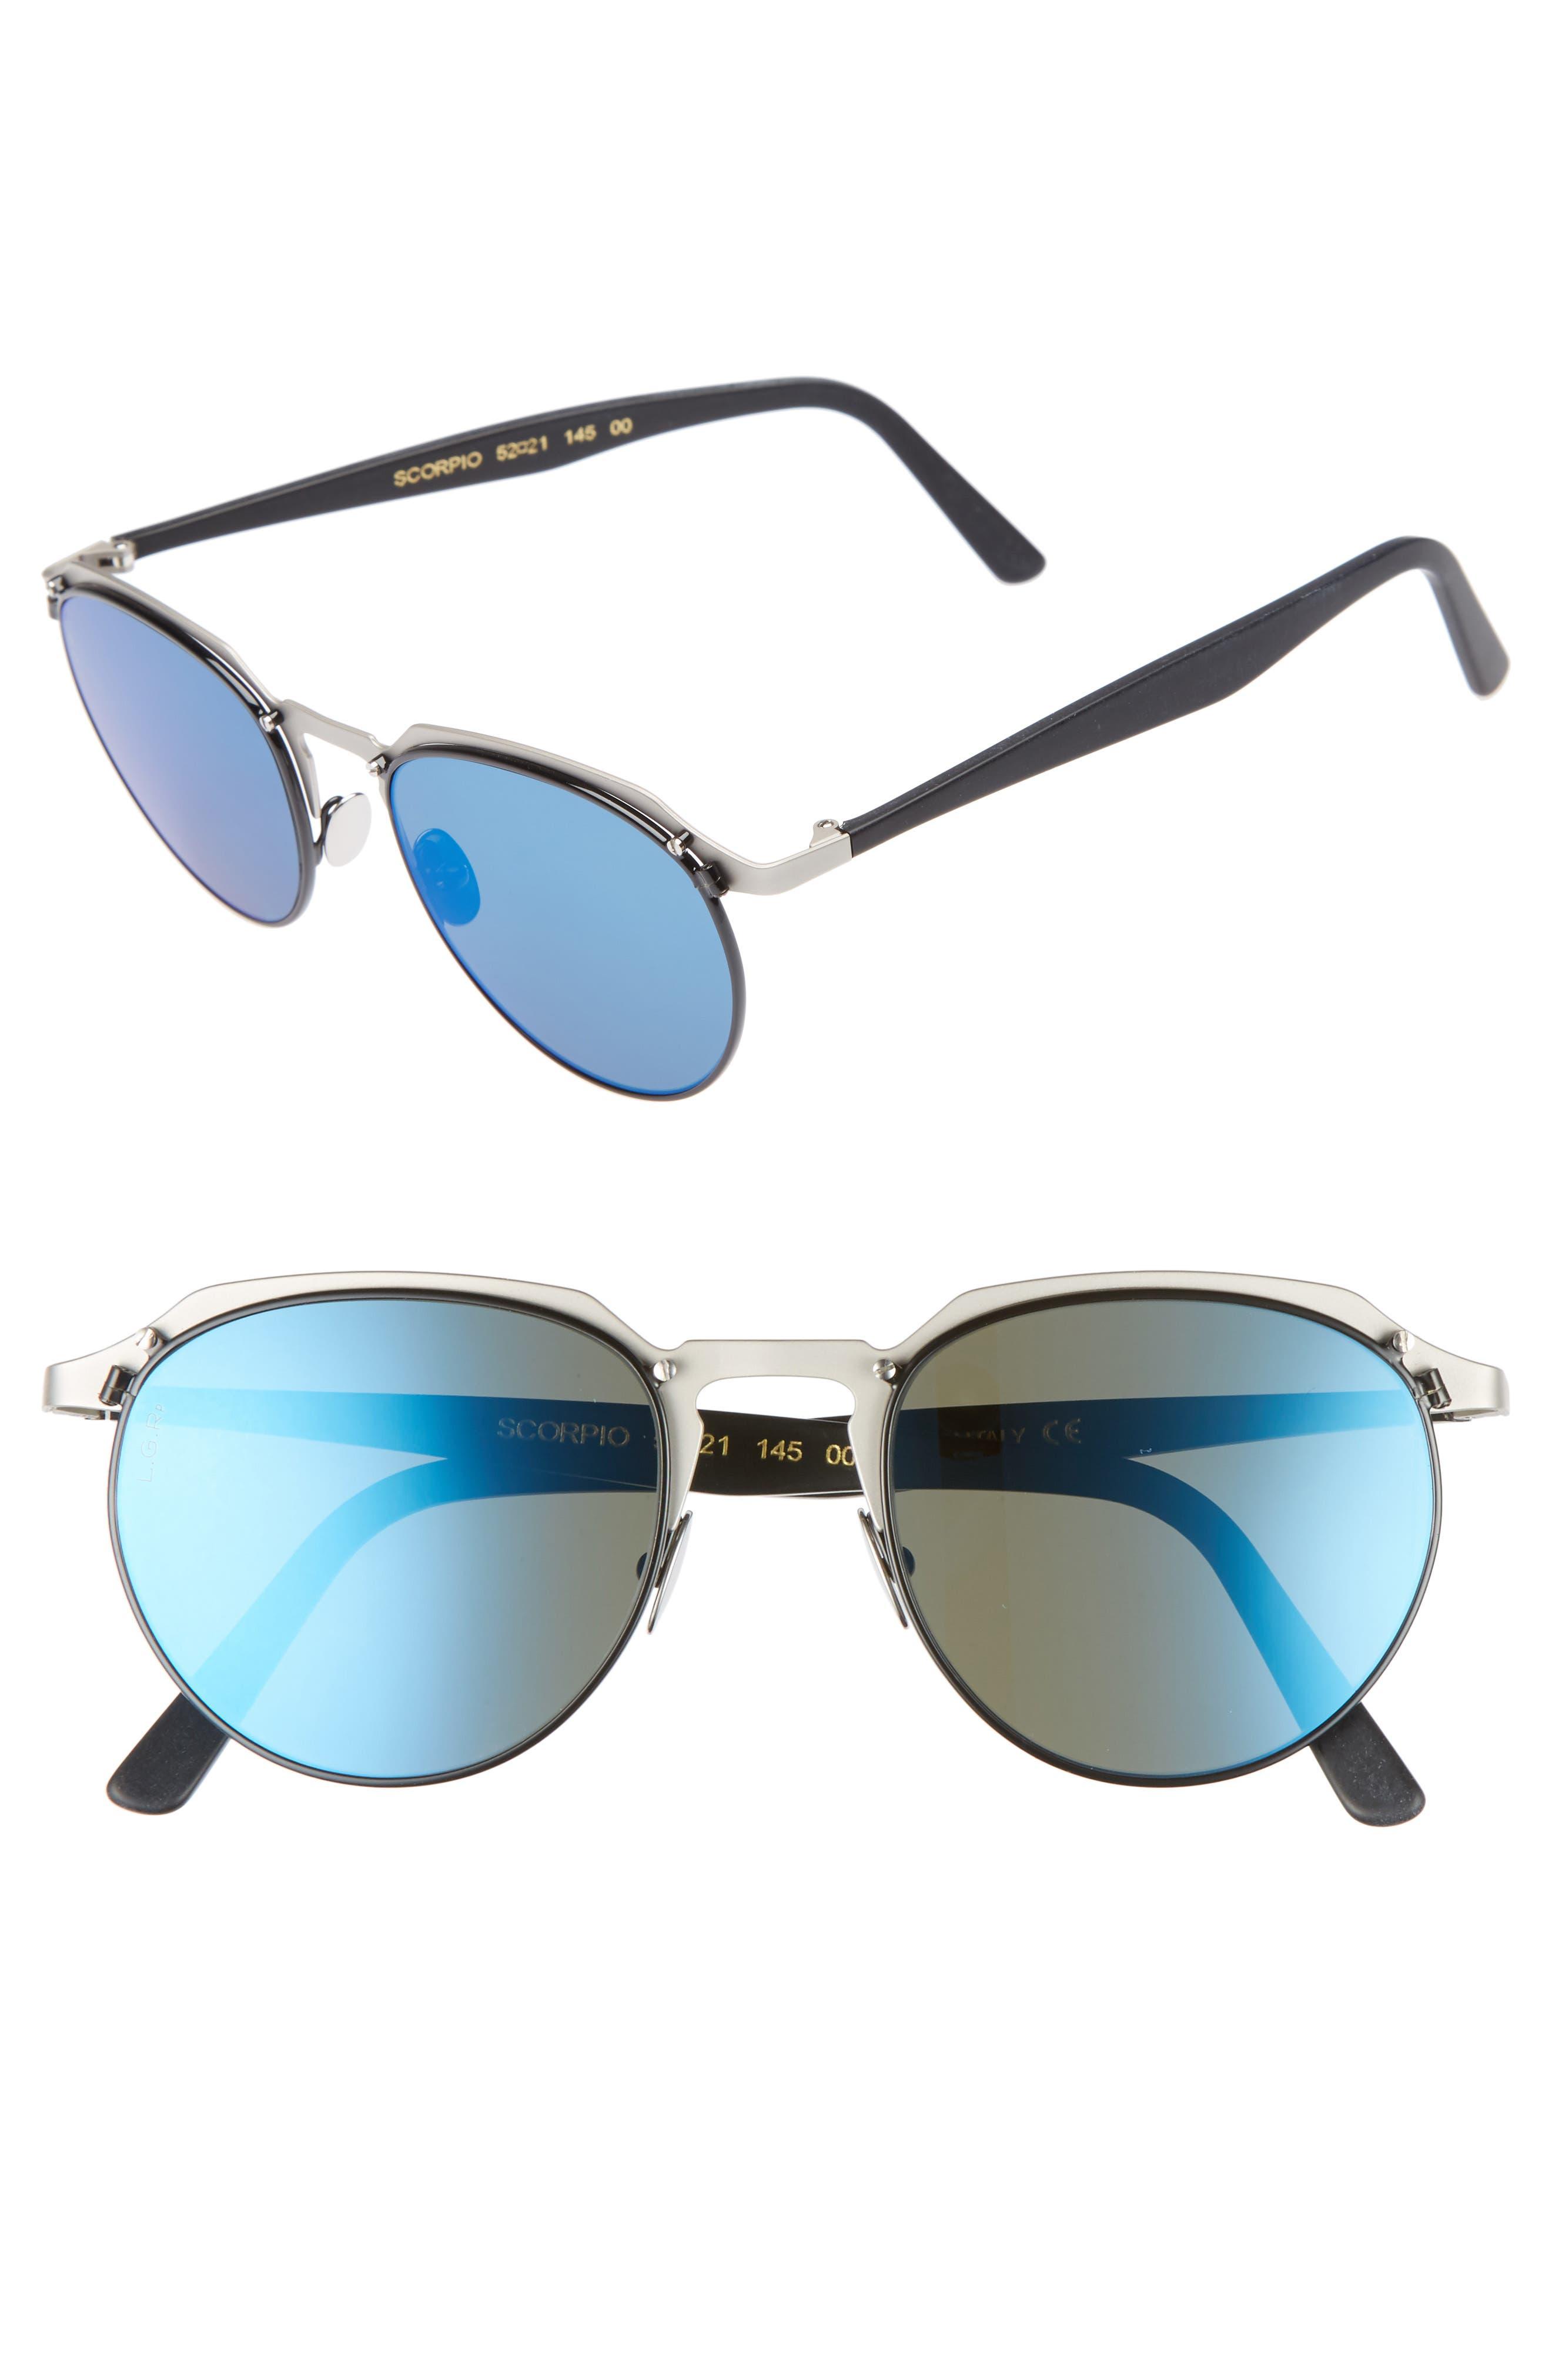 Main Image - L.G.R Scorpio 52mm Polarized Sunglasses